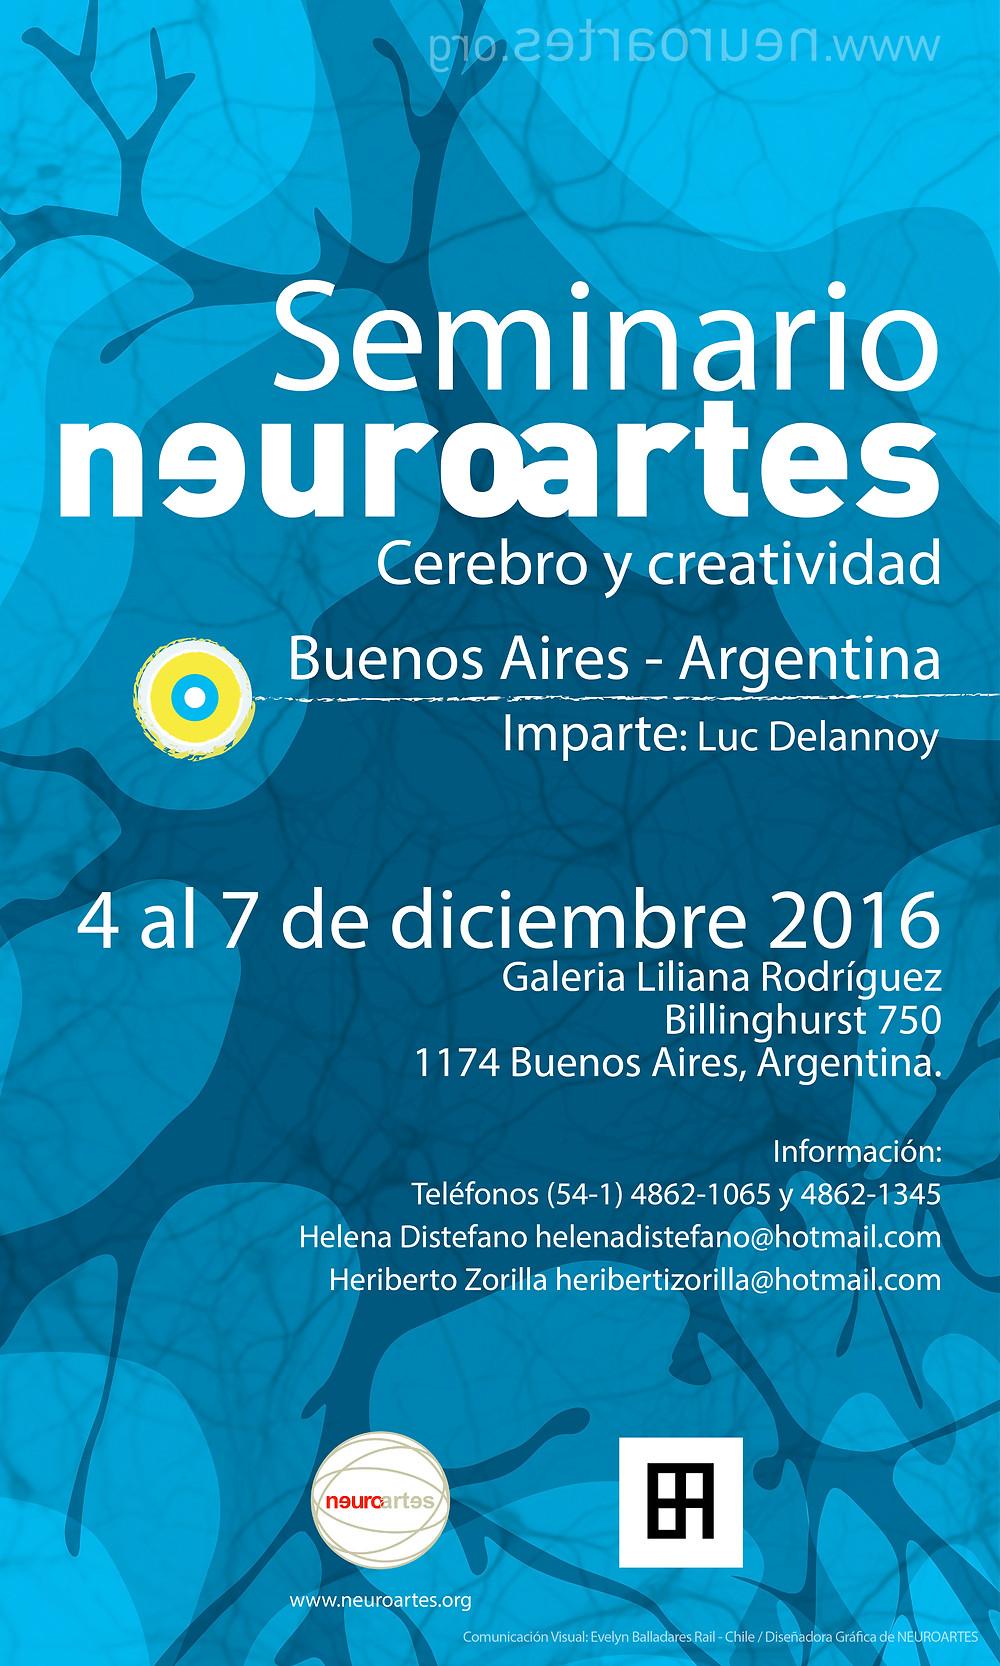 Neuroartes Buenos Aires